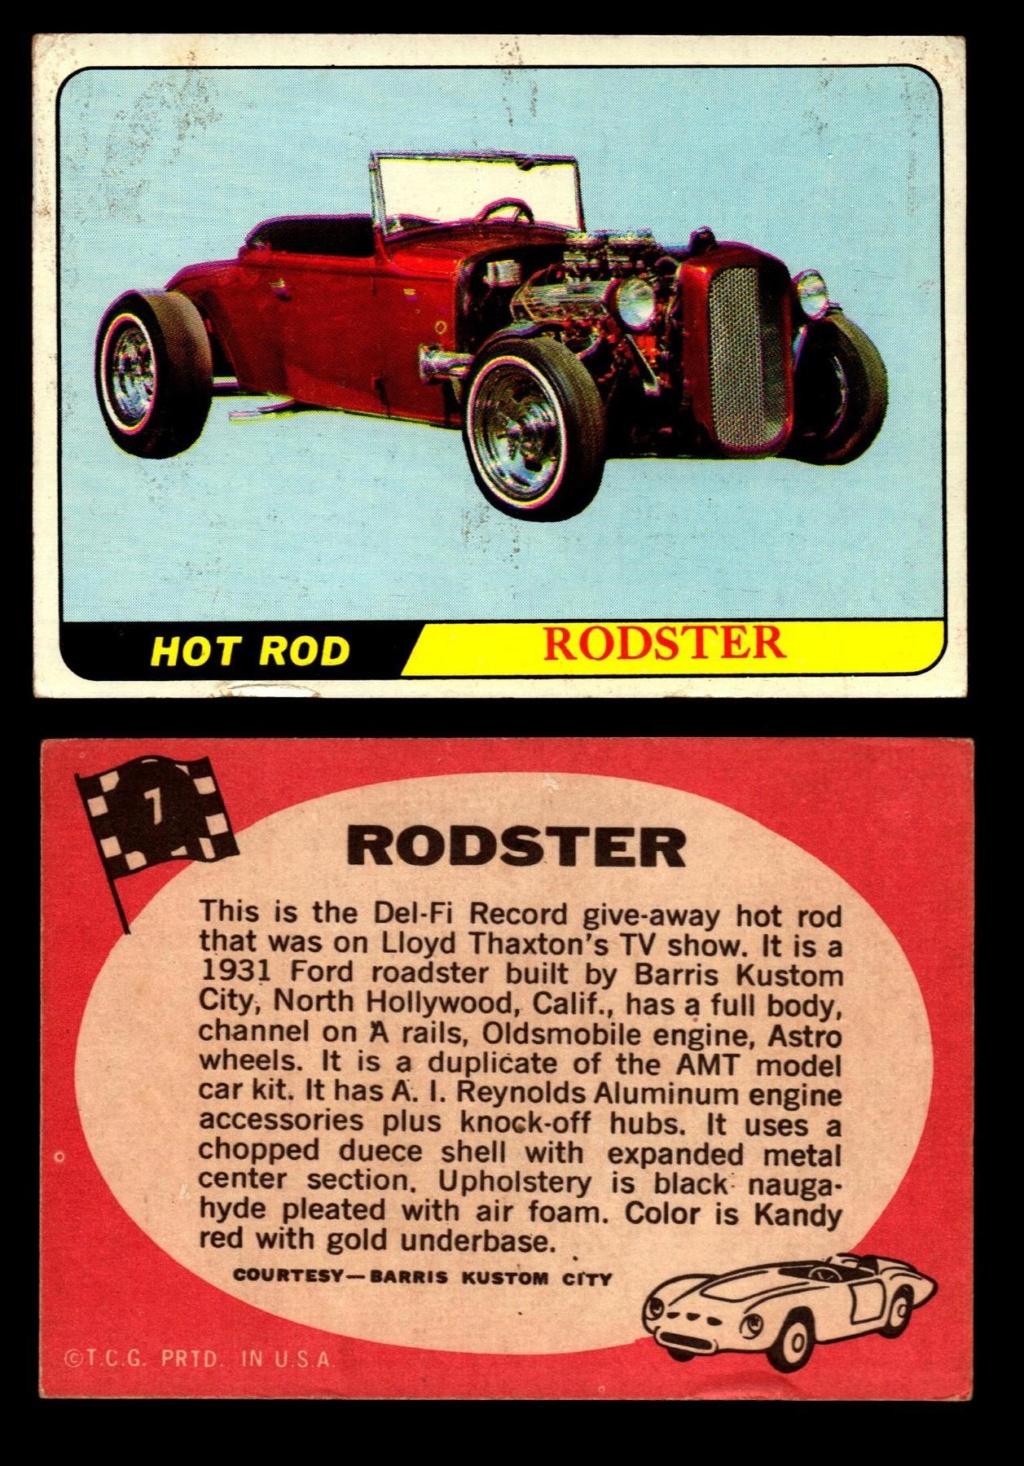 Hot Rods Topps - Vintage Trading Cards 1968 - Custom car - Dragster - Racer - Dream car - Barris Kustom City - Ed Roth Darrill Starbird, Gene Winfield, Bill Cuchenberry 7_e71110